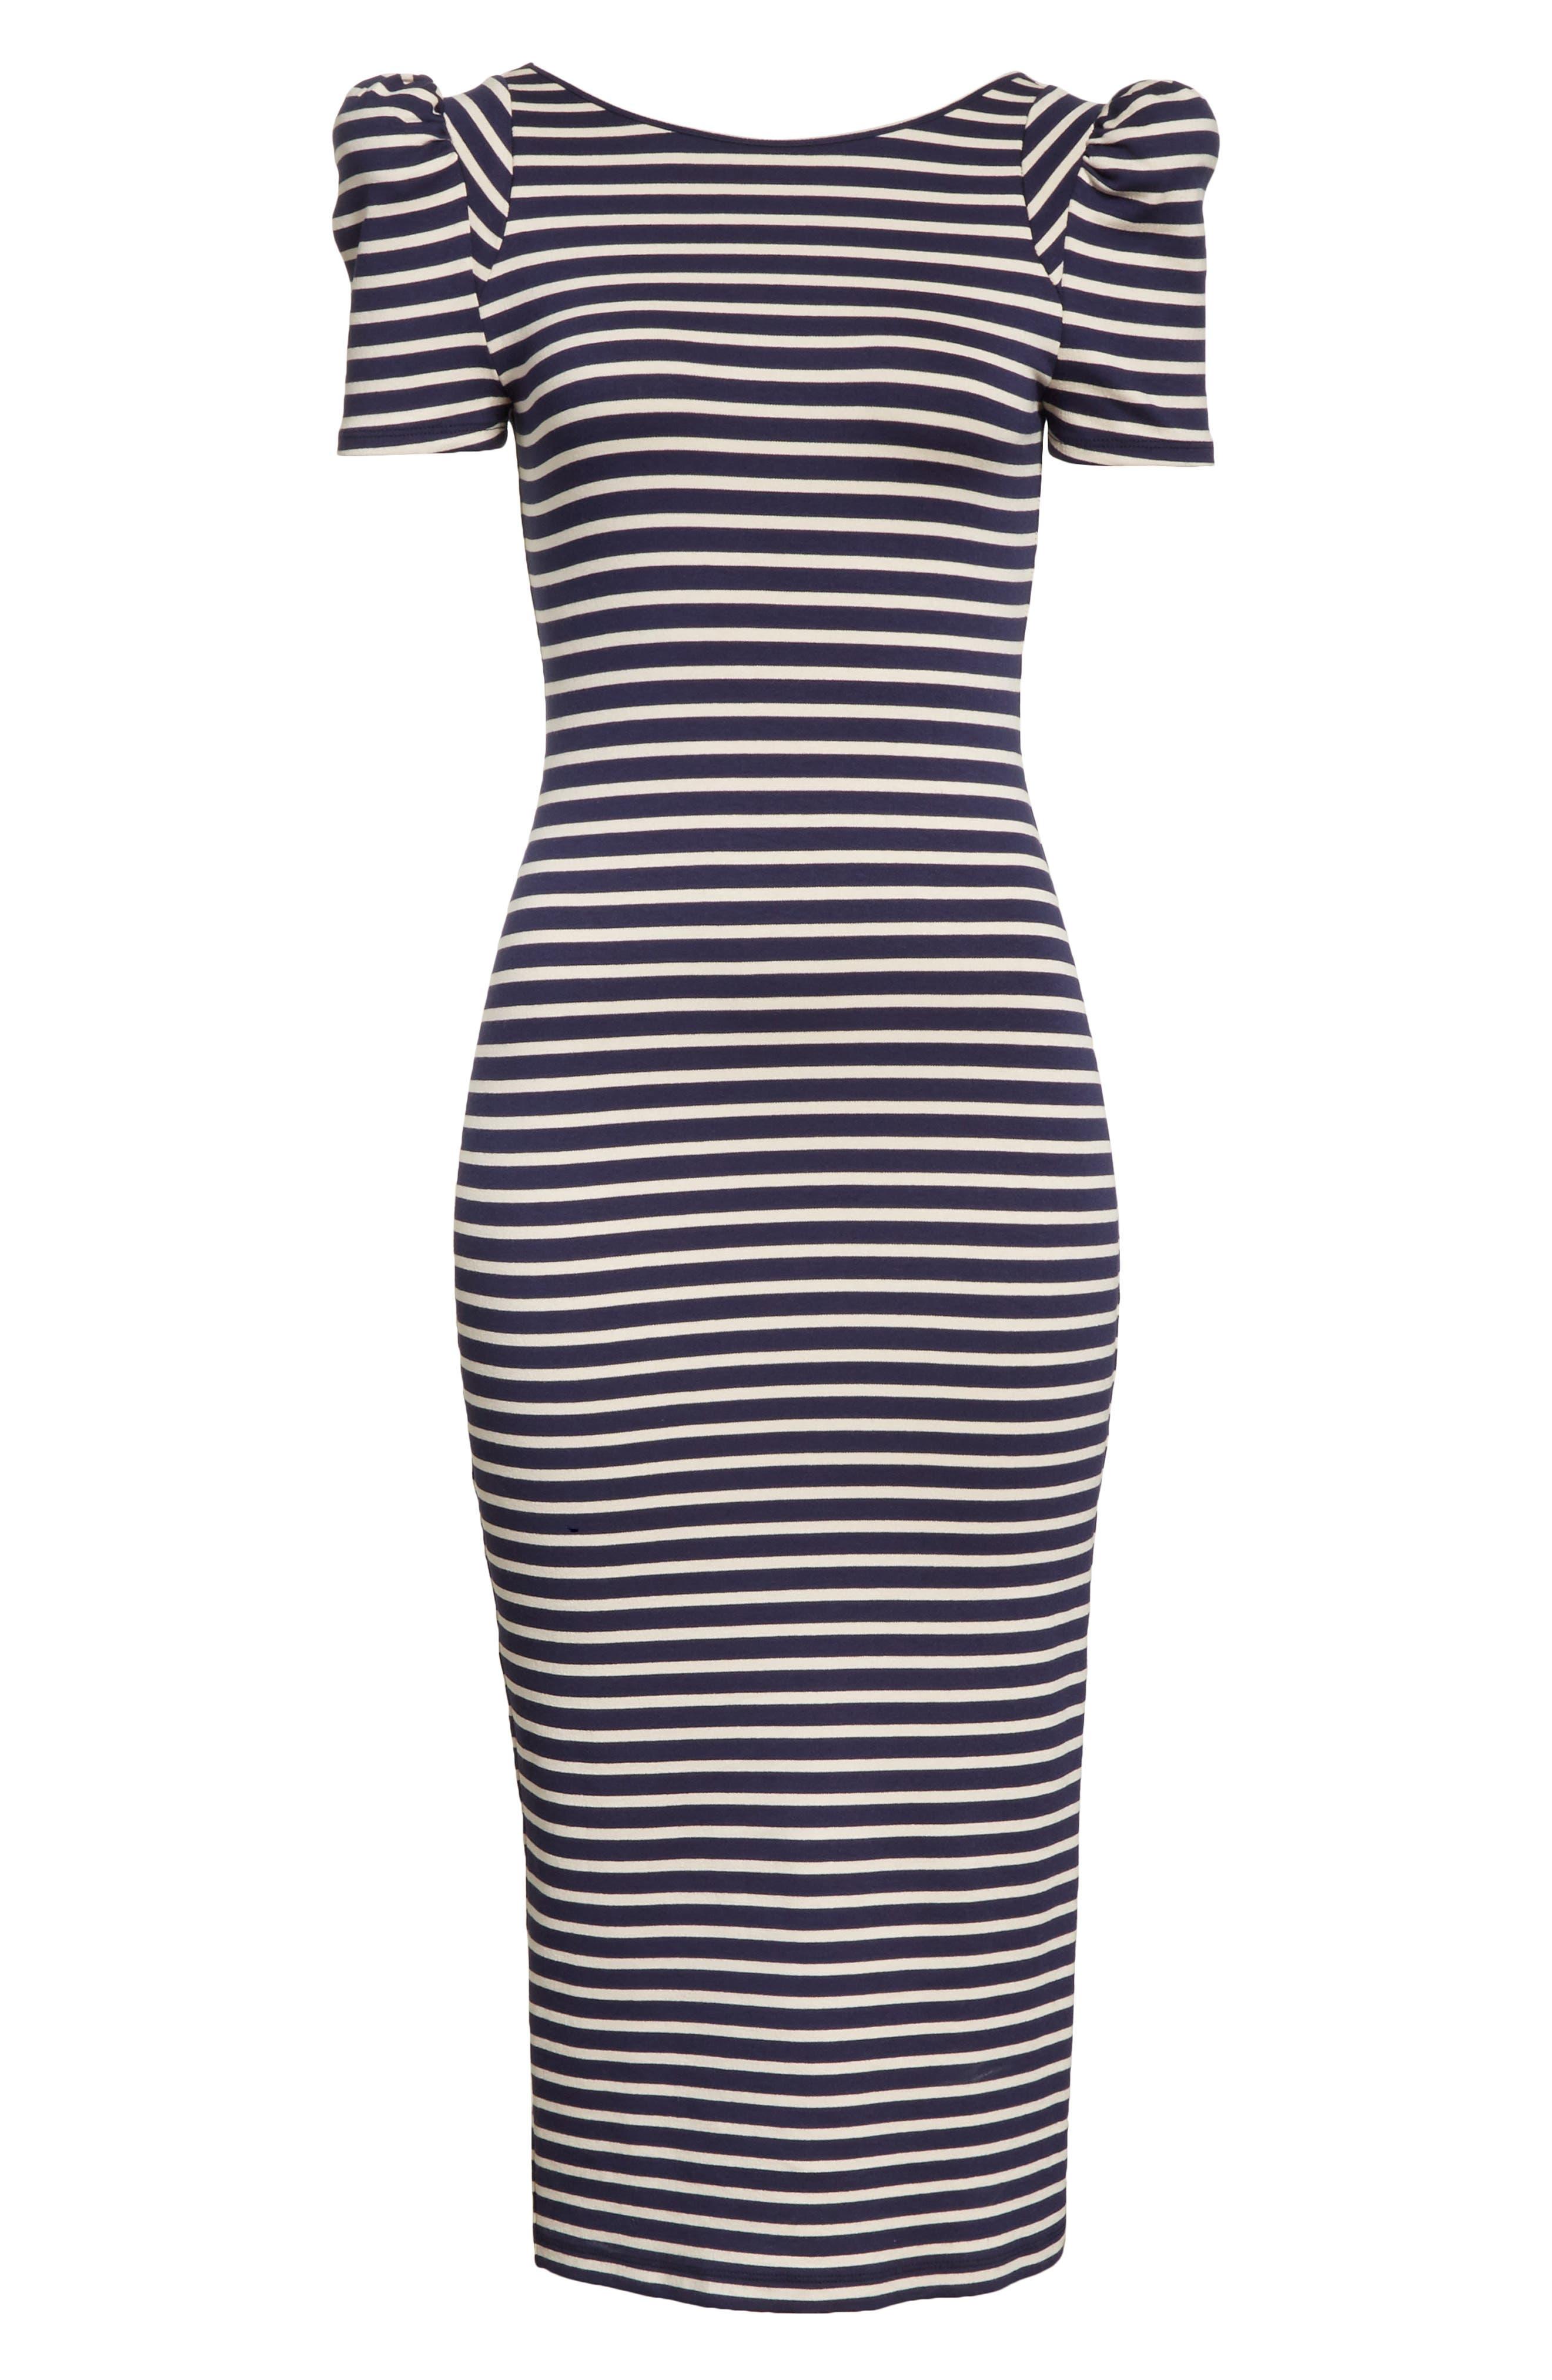 Puff Sleeve Body-Con Midi Dress,                             Alternate thumbnail 5, color,                             Navy Breton Stripe